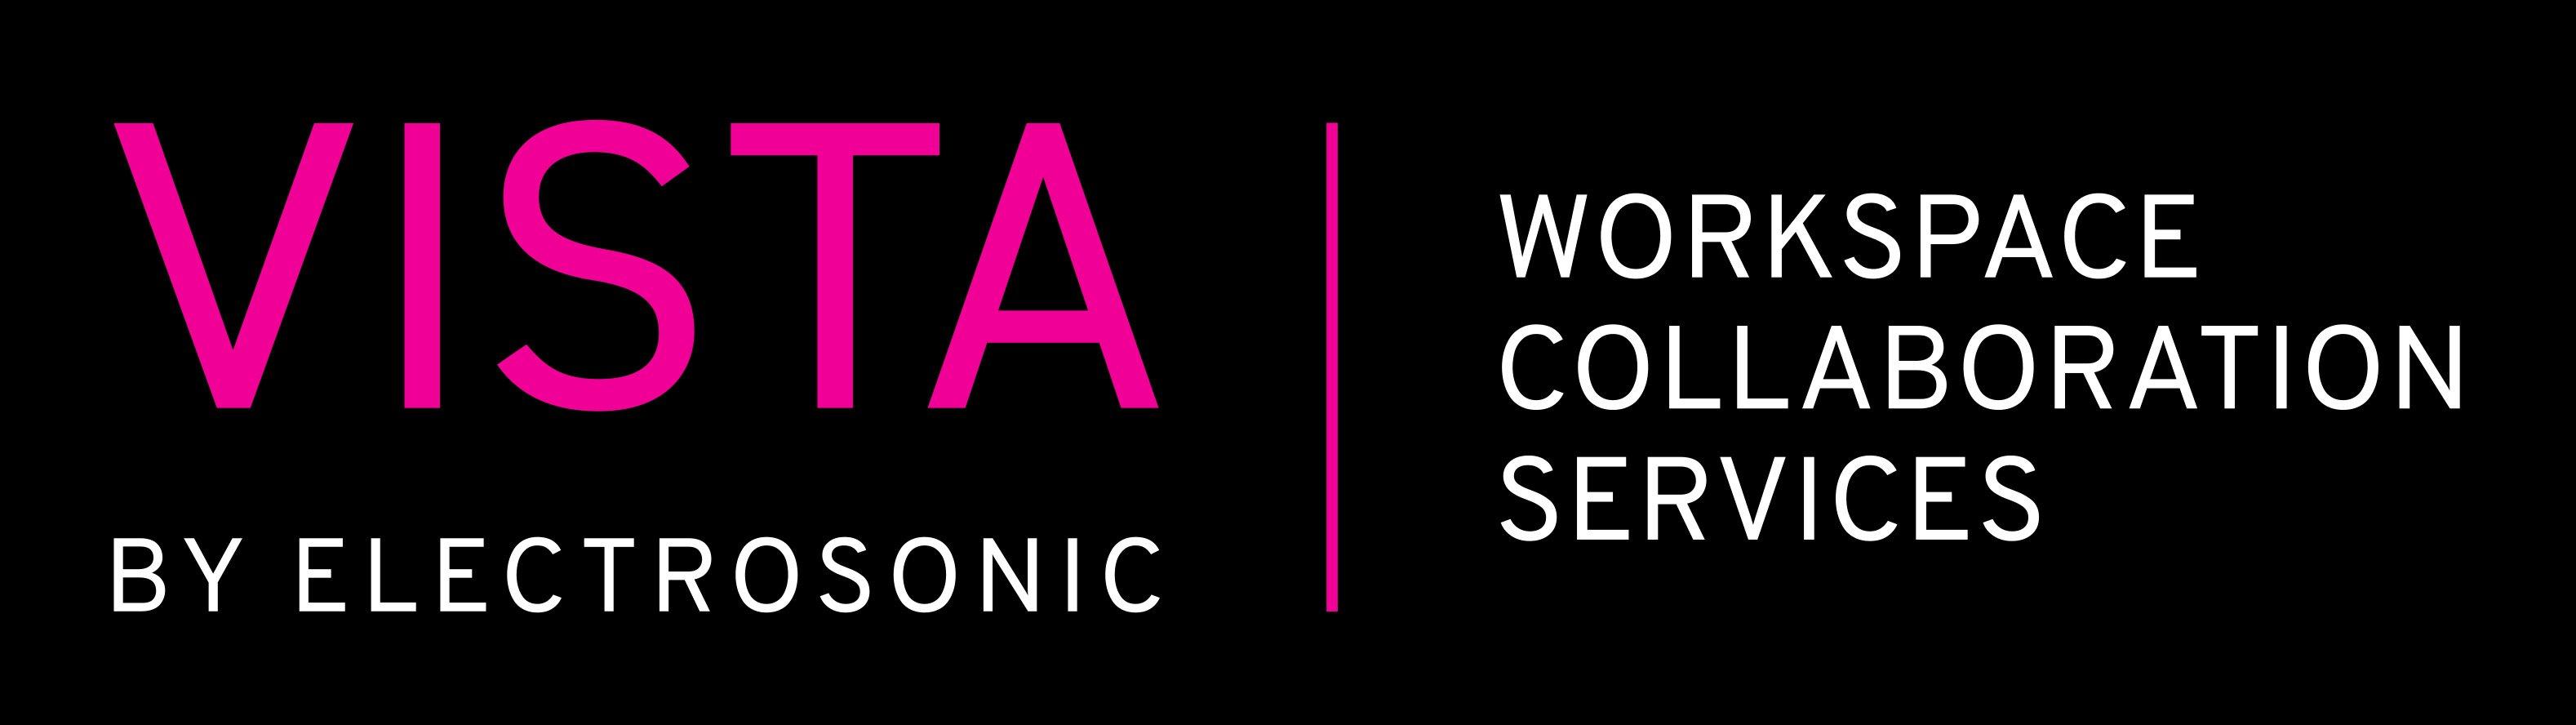 Electrosonic_Vista_Logo_RGB_Neg